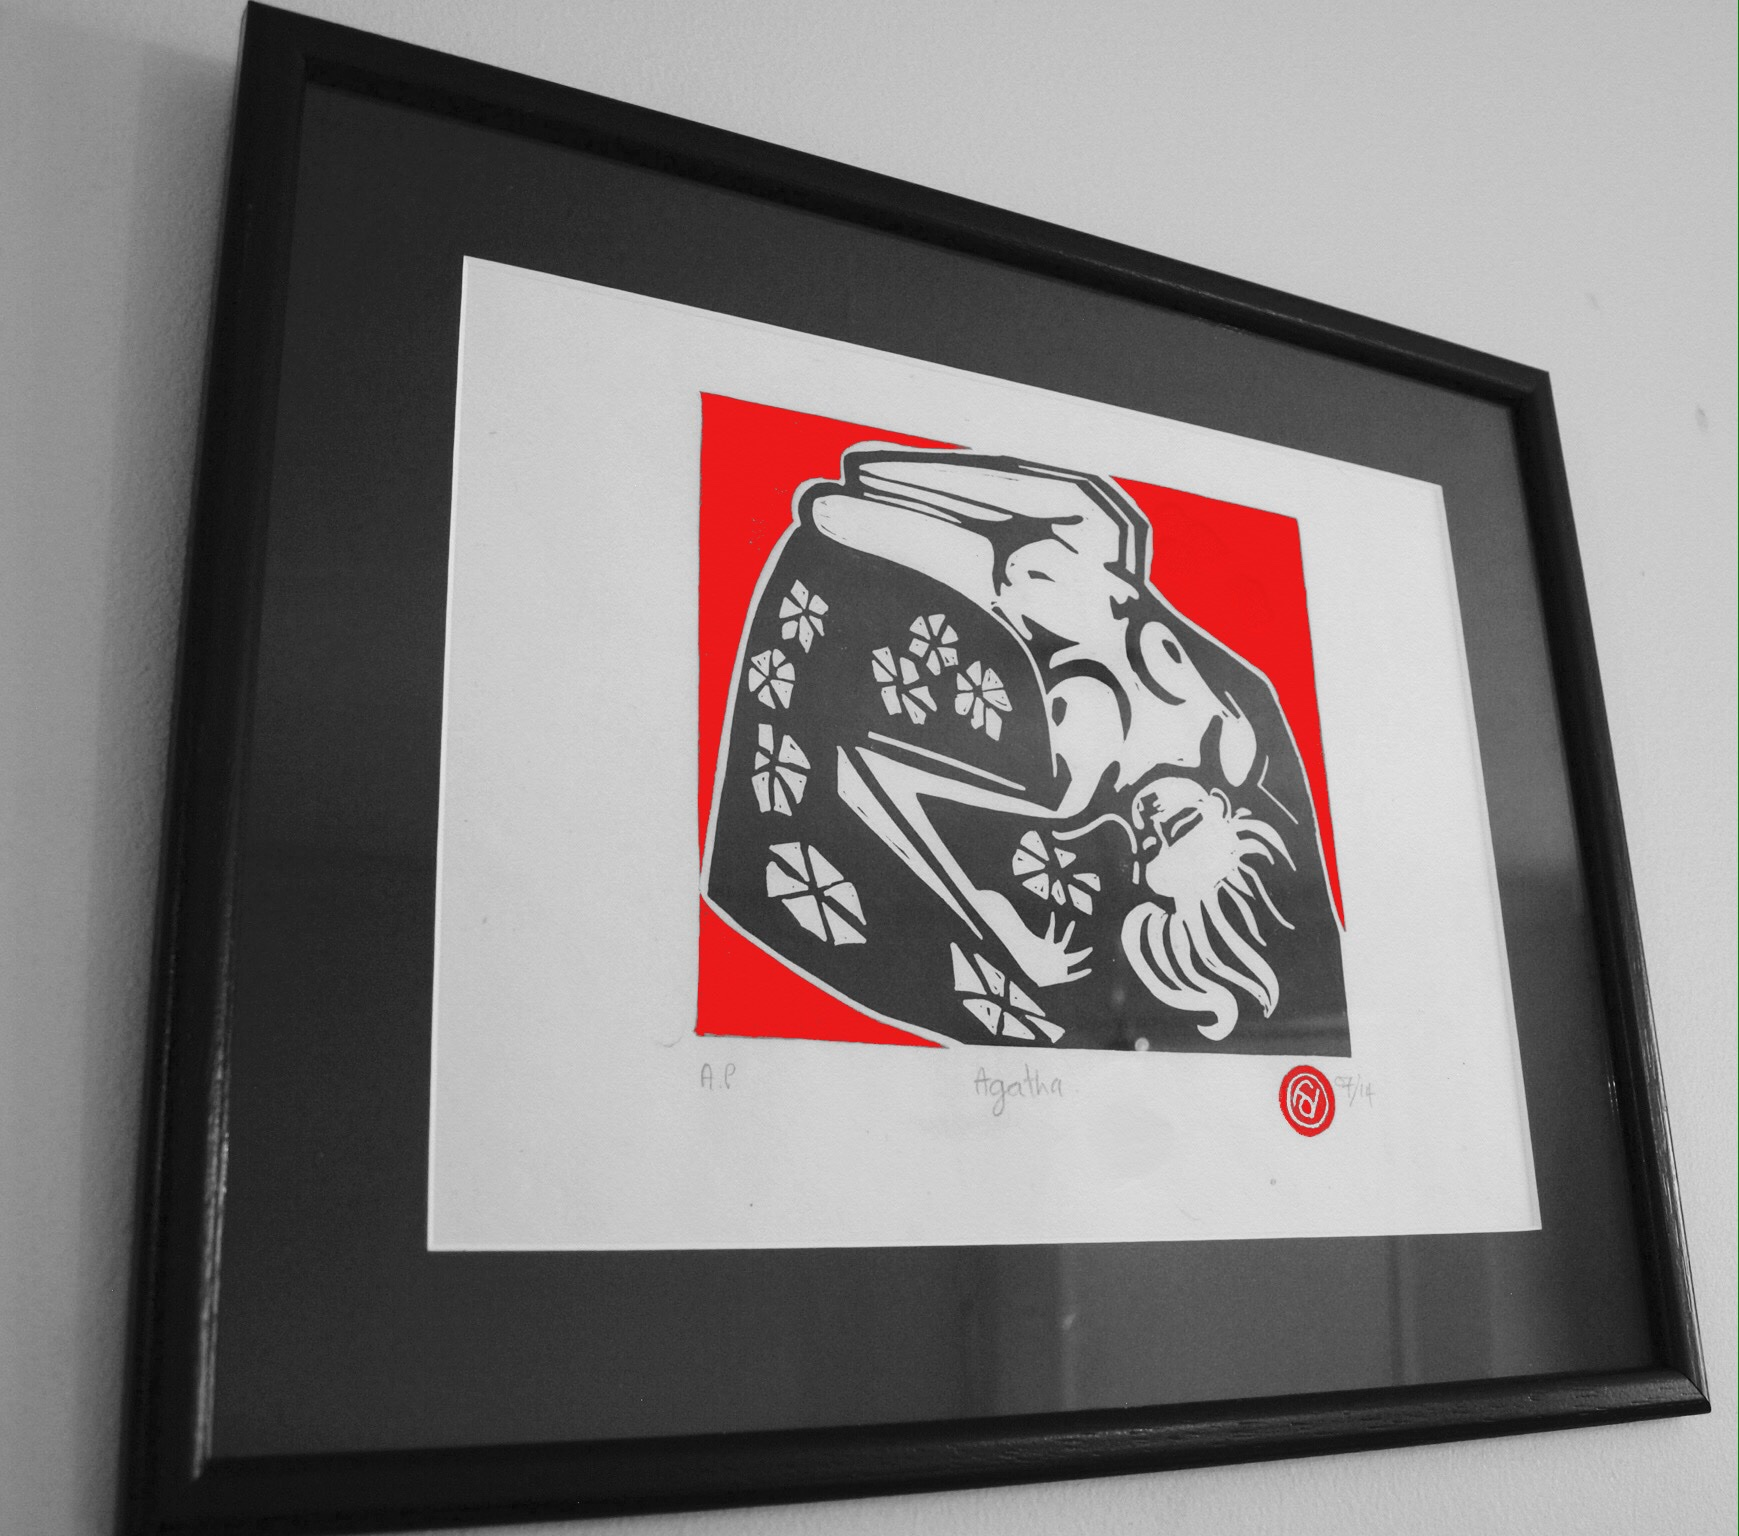 Gallery: Agatha Linocut print